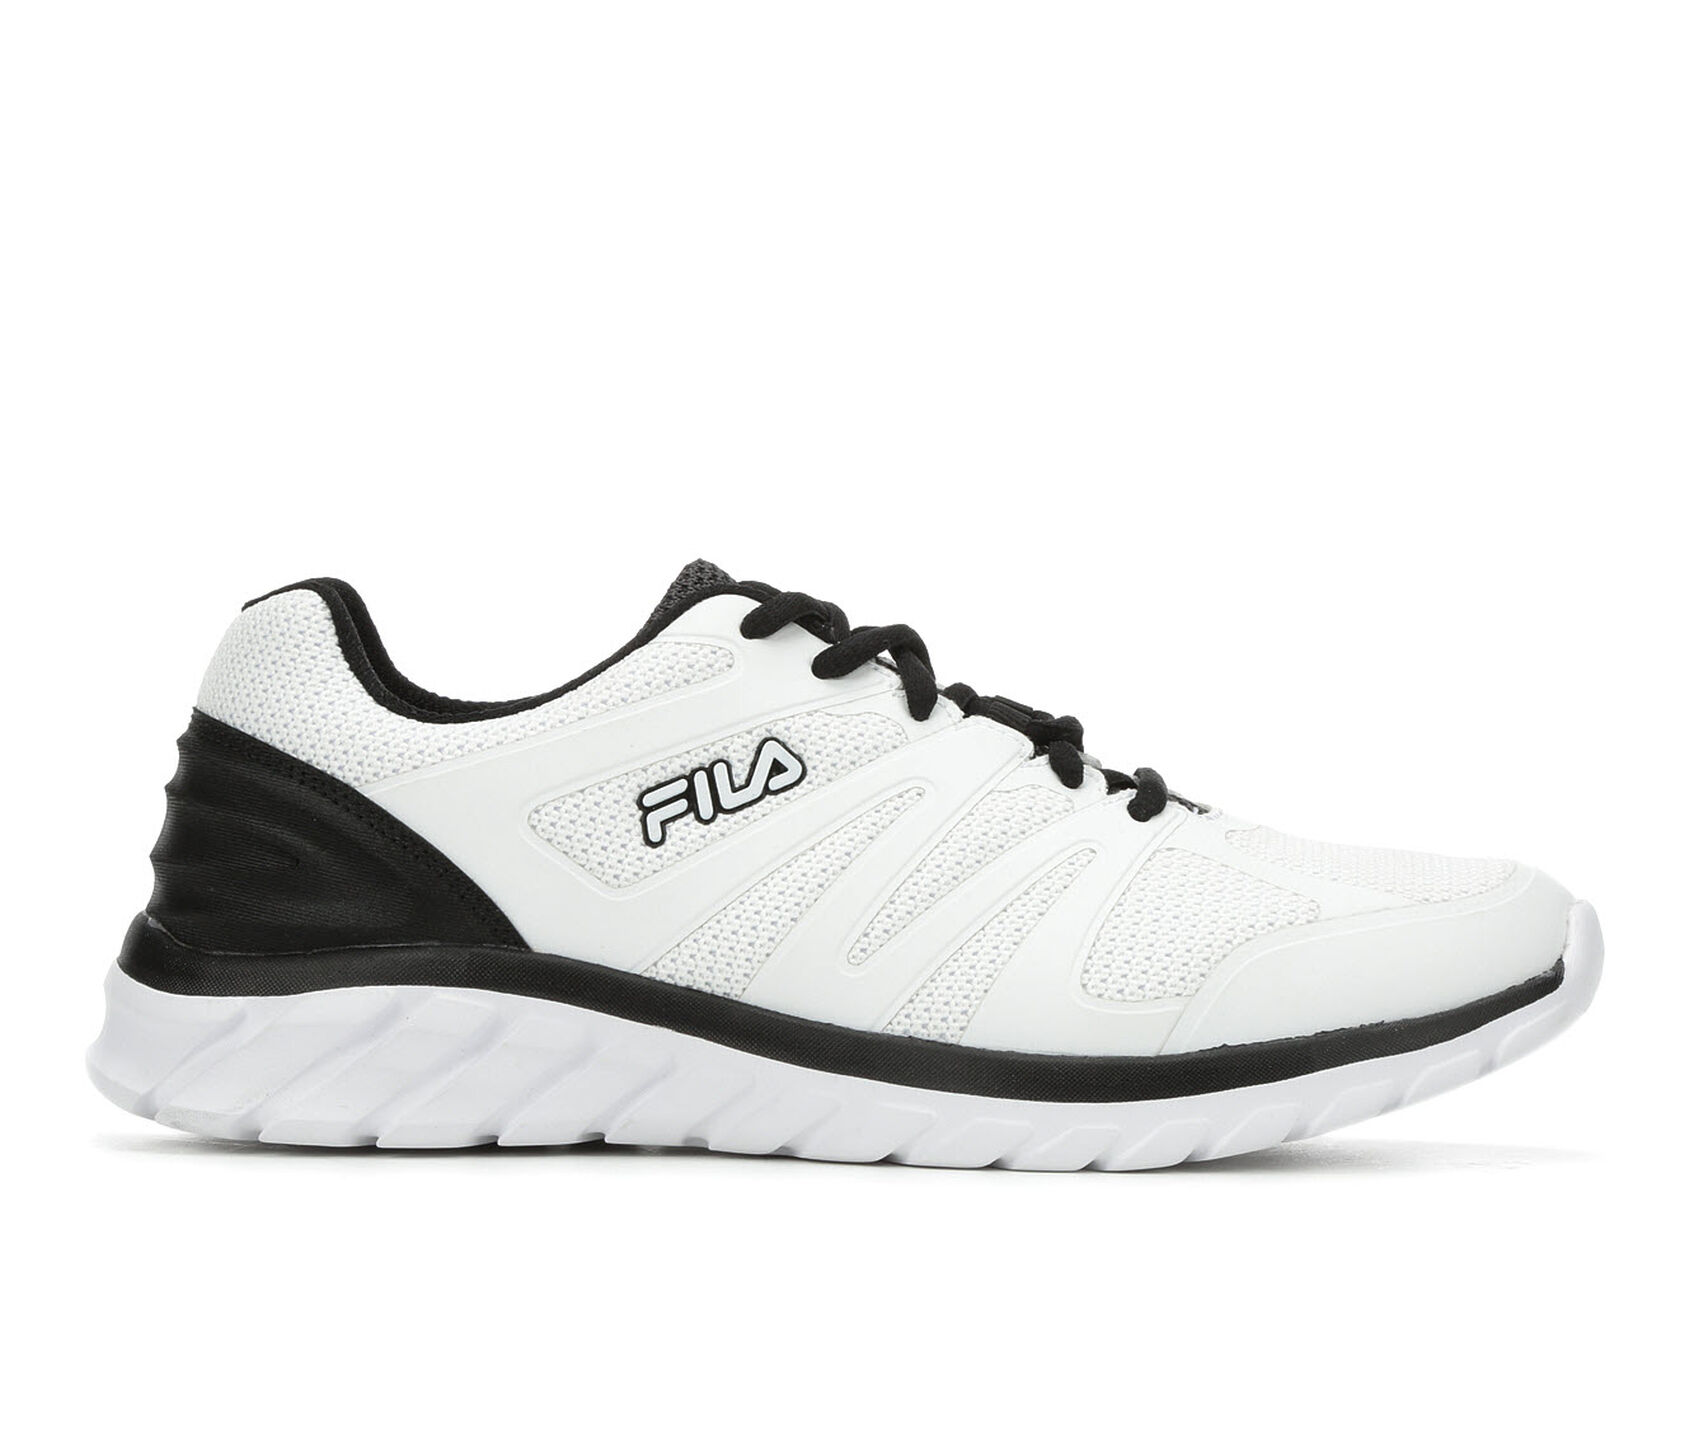 cbe197c59 Men's Fila Memory Cryptonic 3 Running Shoes | Shoe Carnival